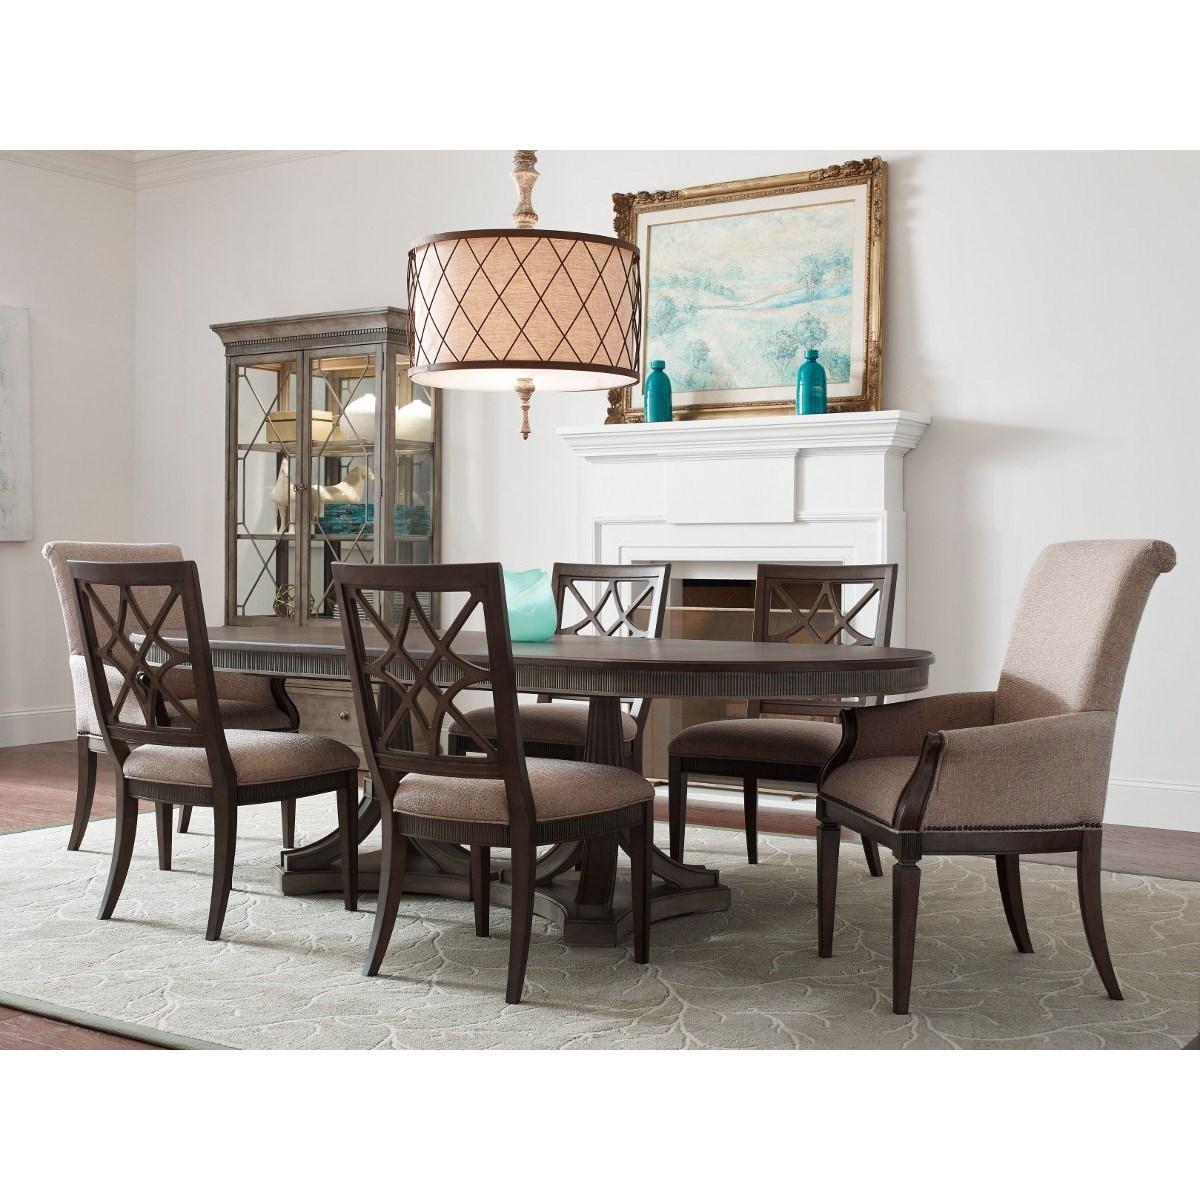 Seven Piece Table & Chair Set